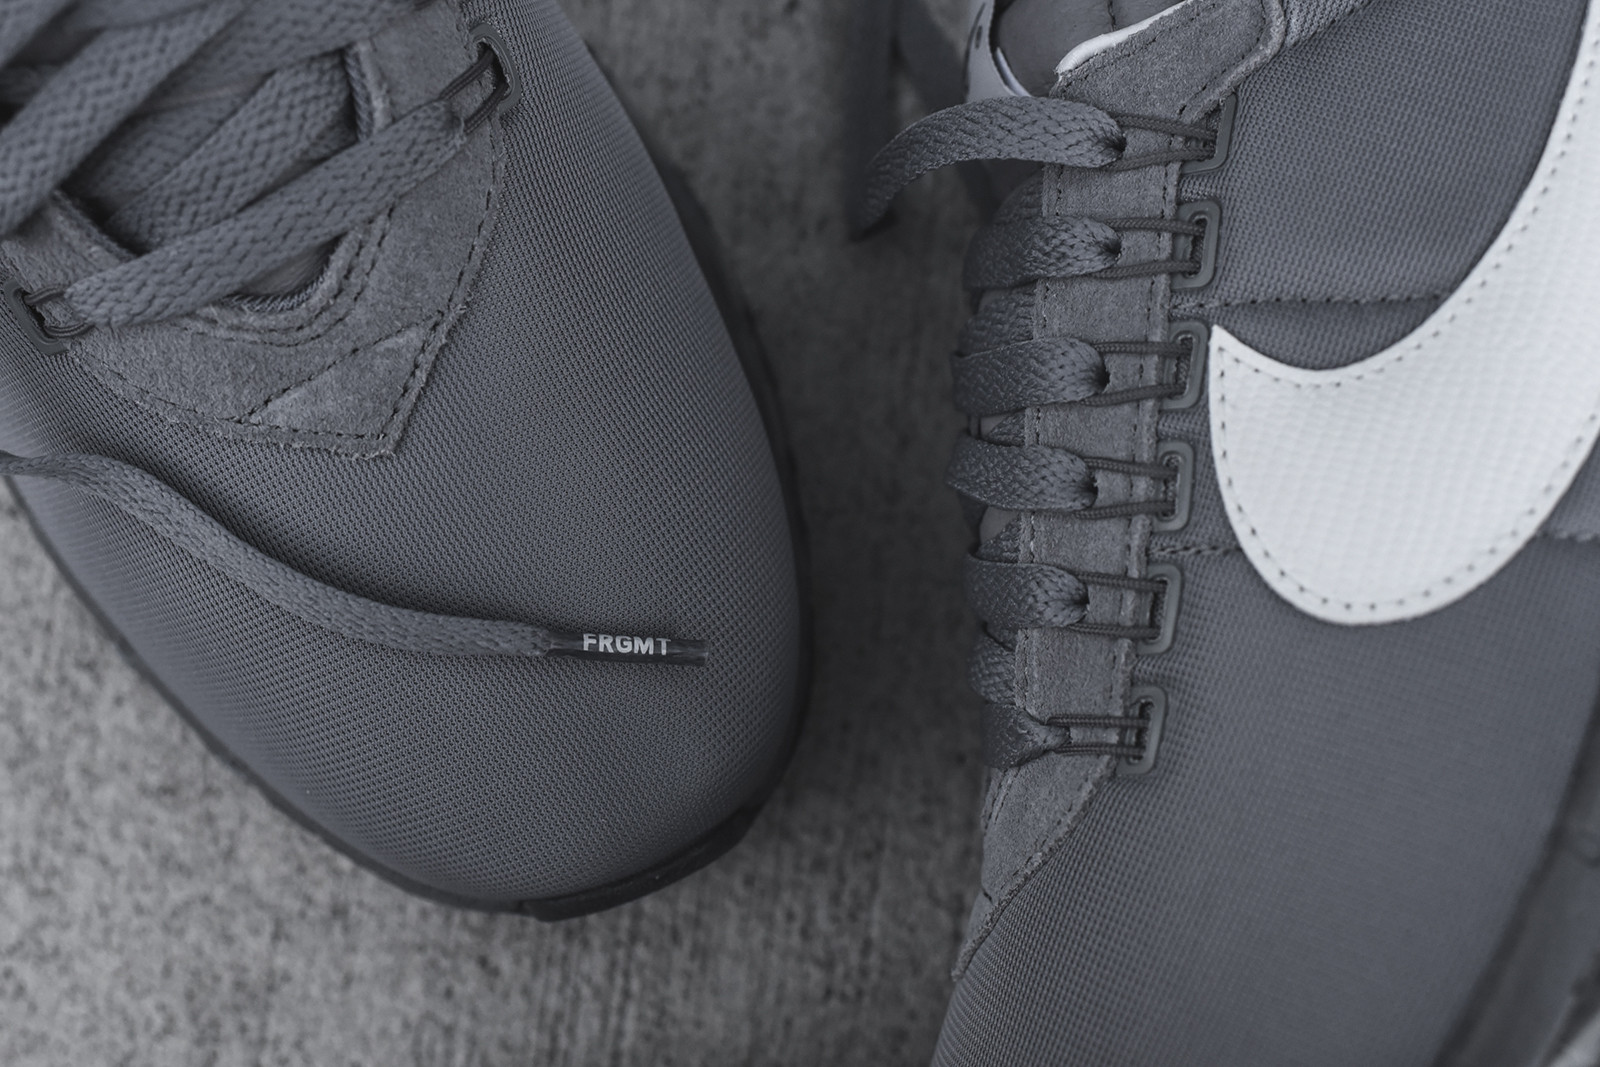 6c1867525ed8 Fragment Nike Air Max LD Zero 885893-002 Toe Detail